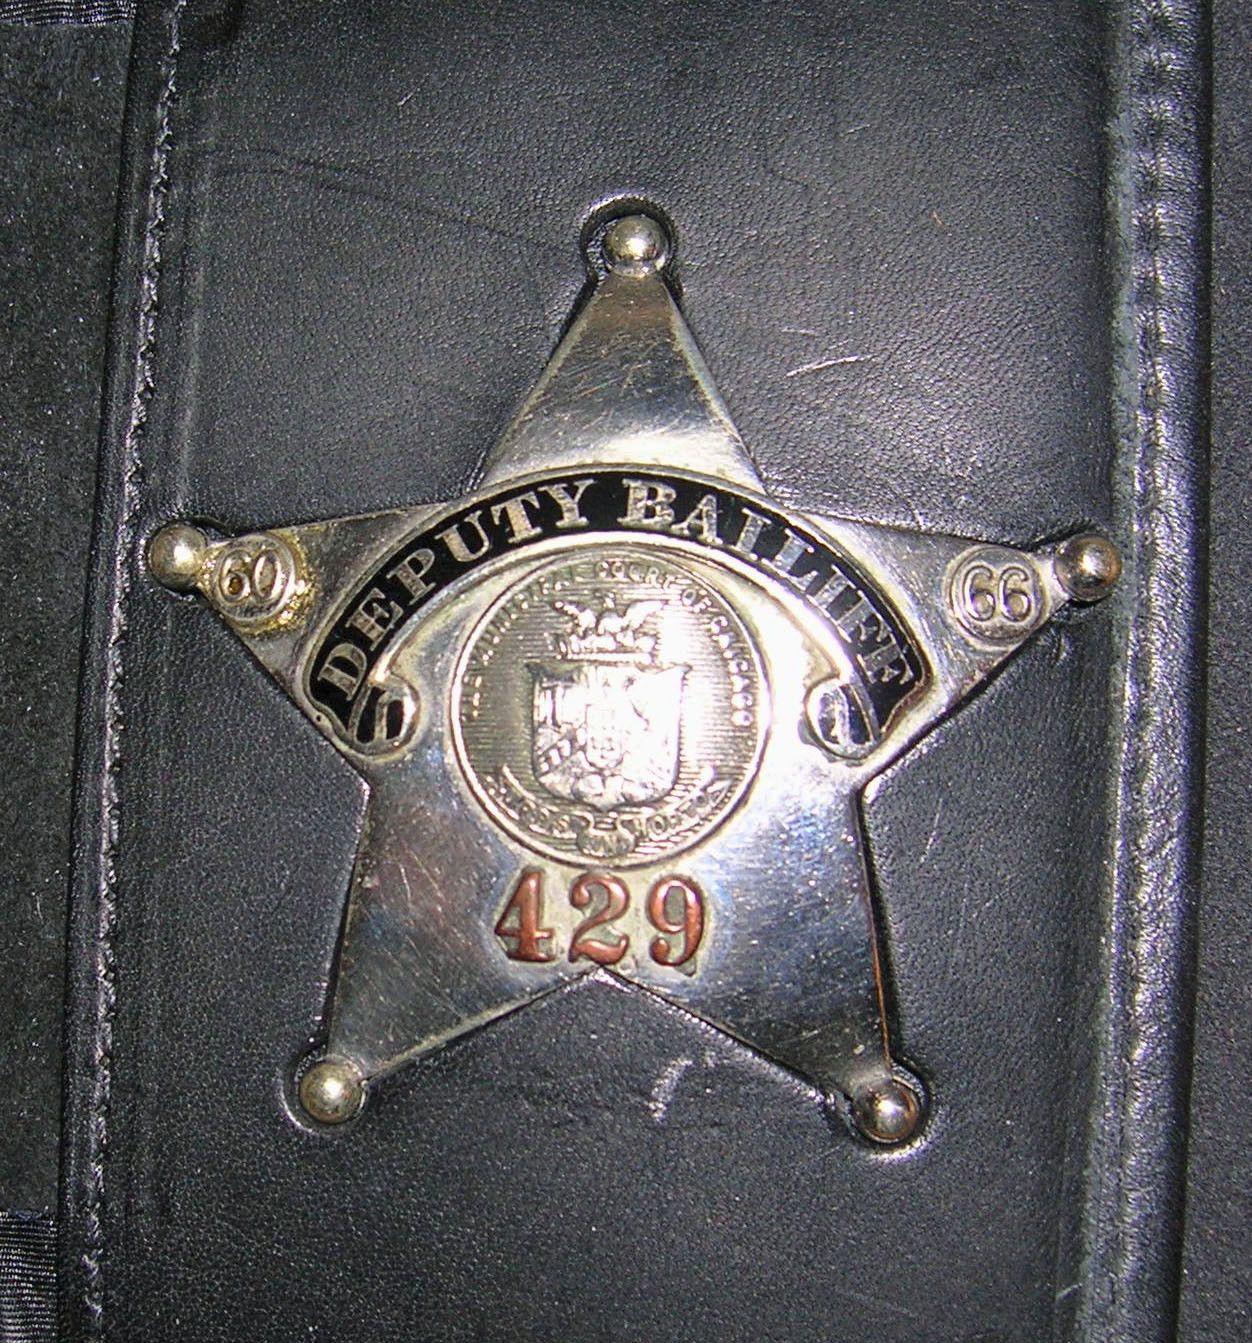 Deputy Bailiff, Court of Chicago (C H Hanson)   Police/Law